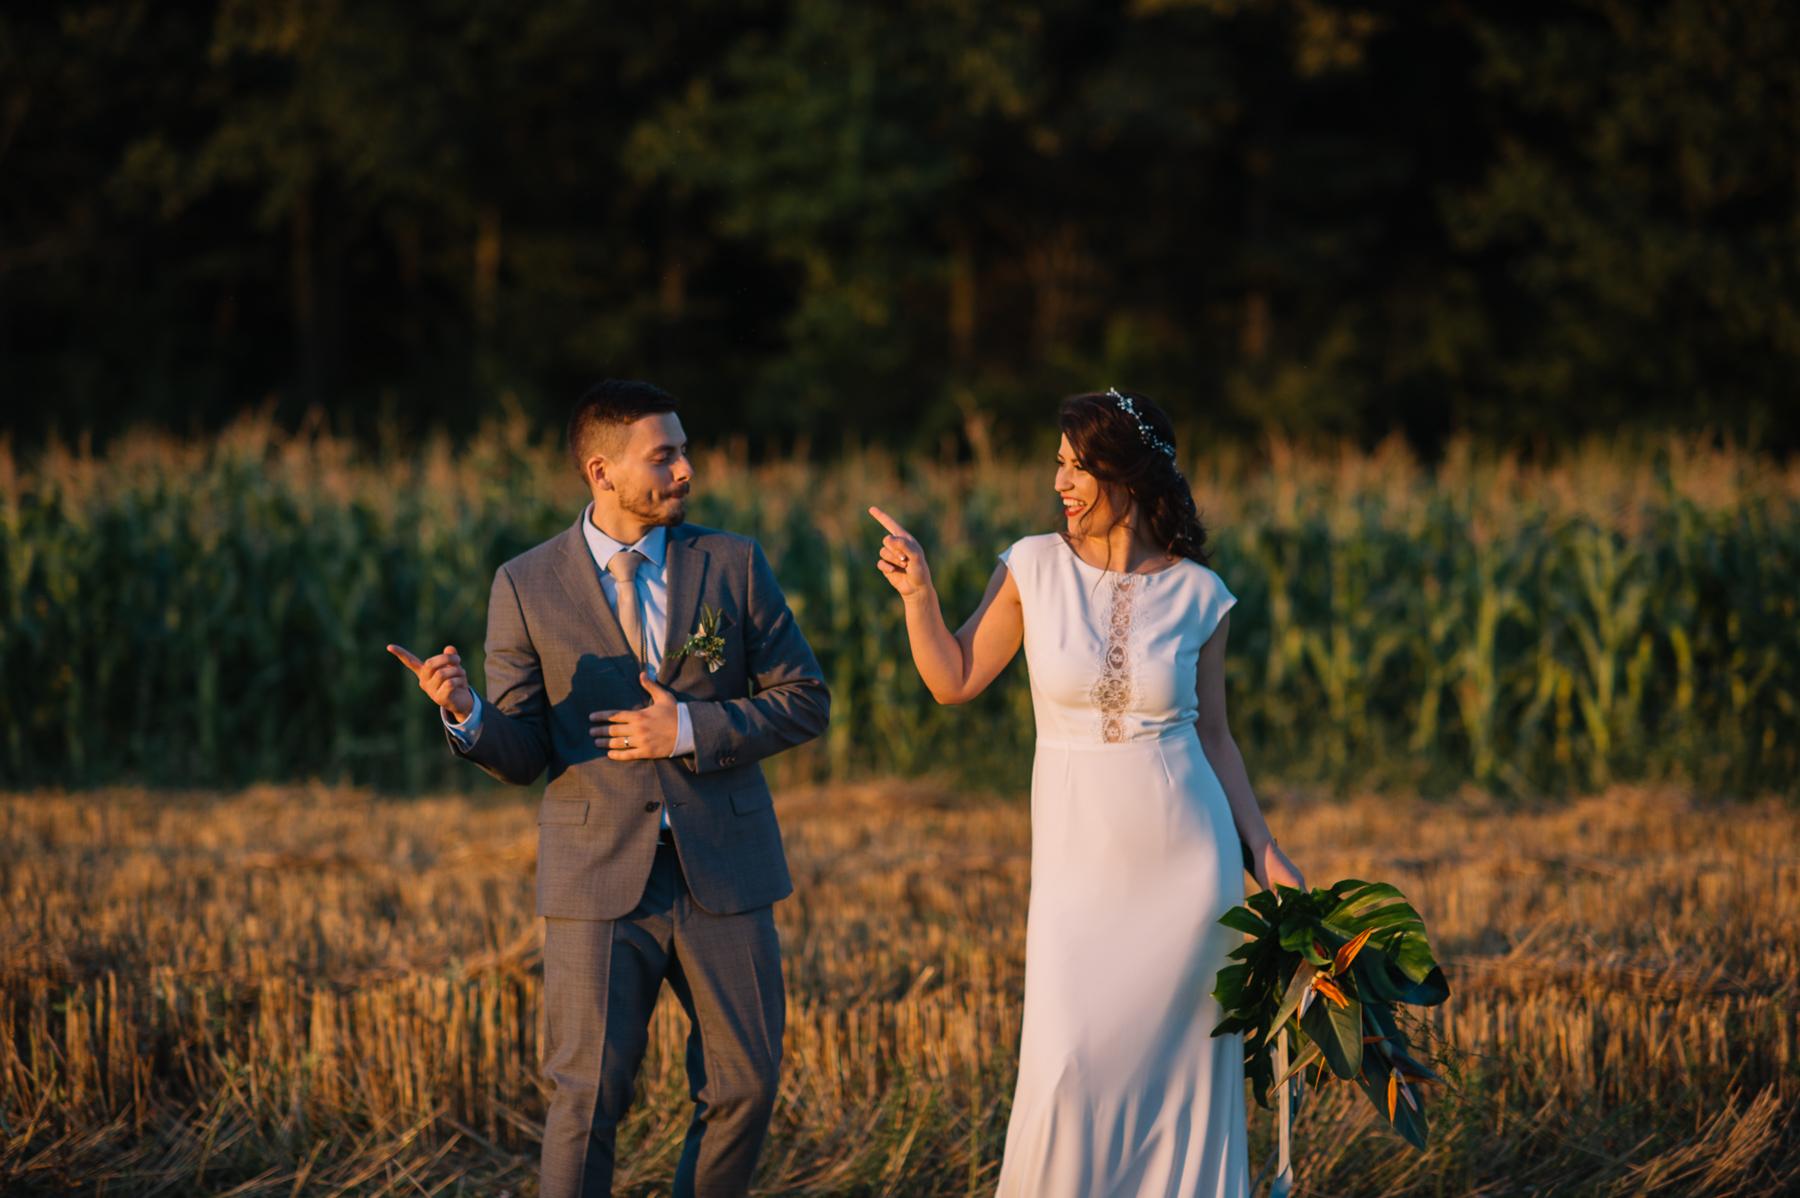 wedding deersphotography0001